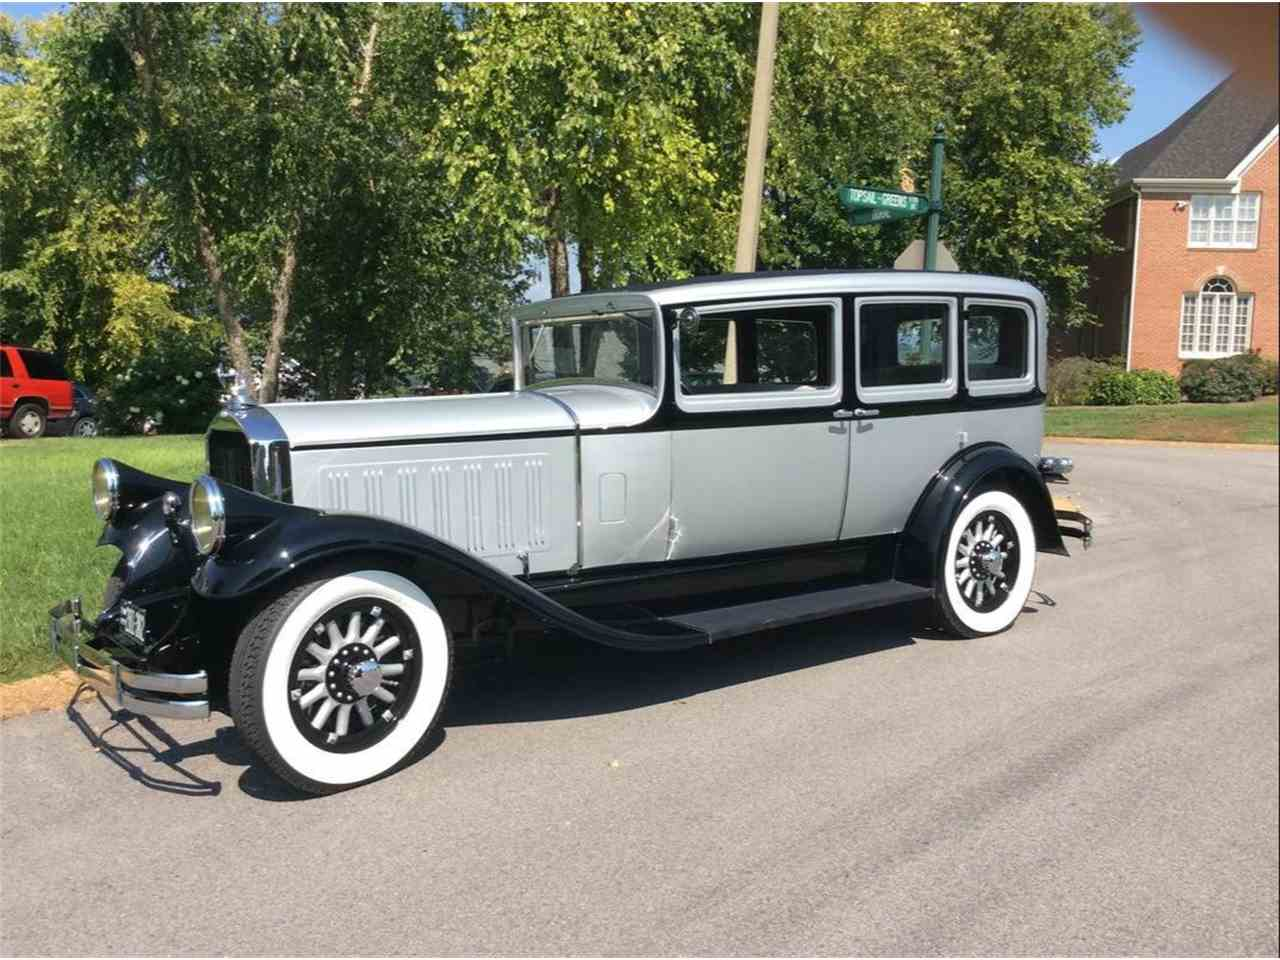 1929 Pierce-Arrow Automobile for Sale   ClassicCars.com   CC-1045305